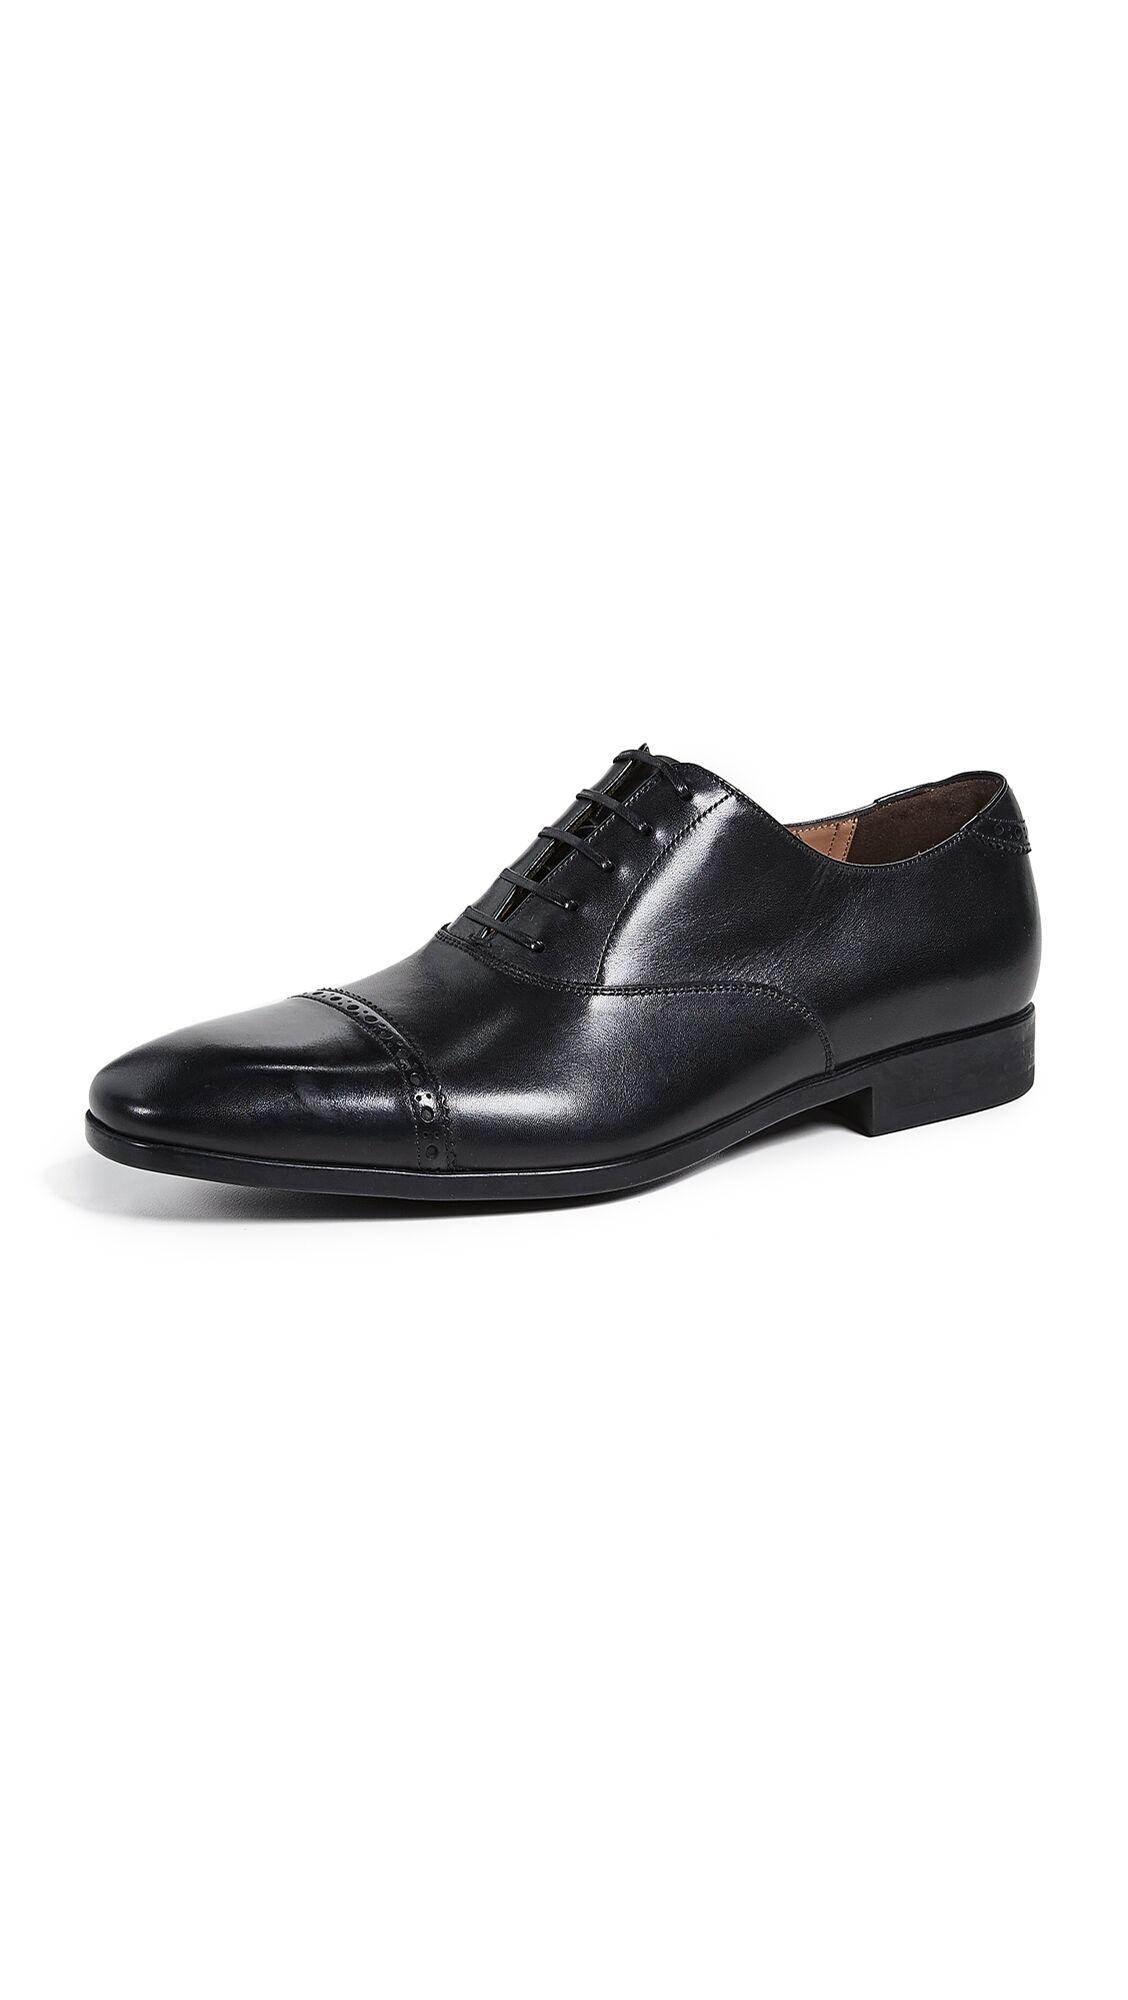 Salvatore Ferragamo Boston Cap Toe Lace Up Shoes - Black - Size: 12